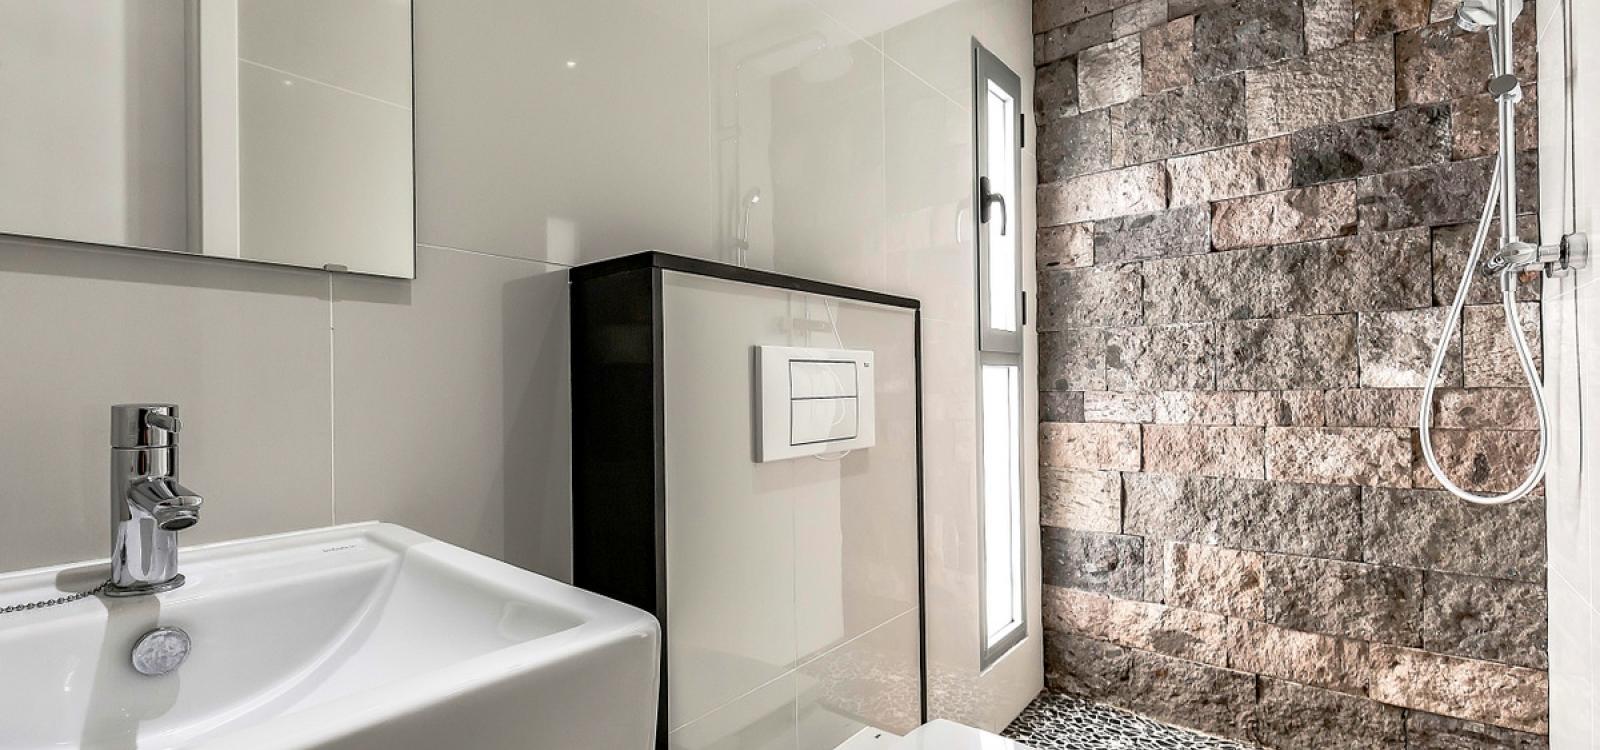 (D55) Villa with 5 Bedrooms, 4 Bathrooms